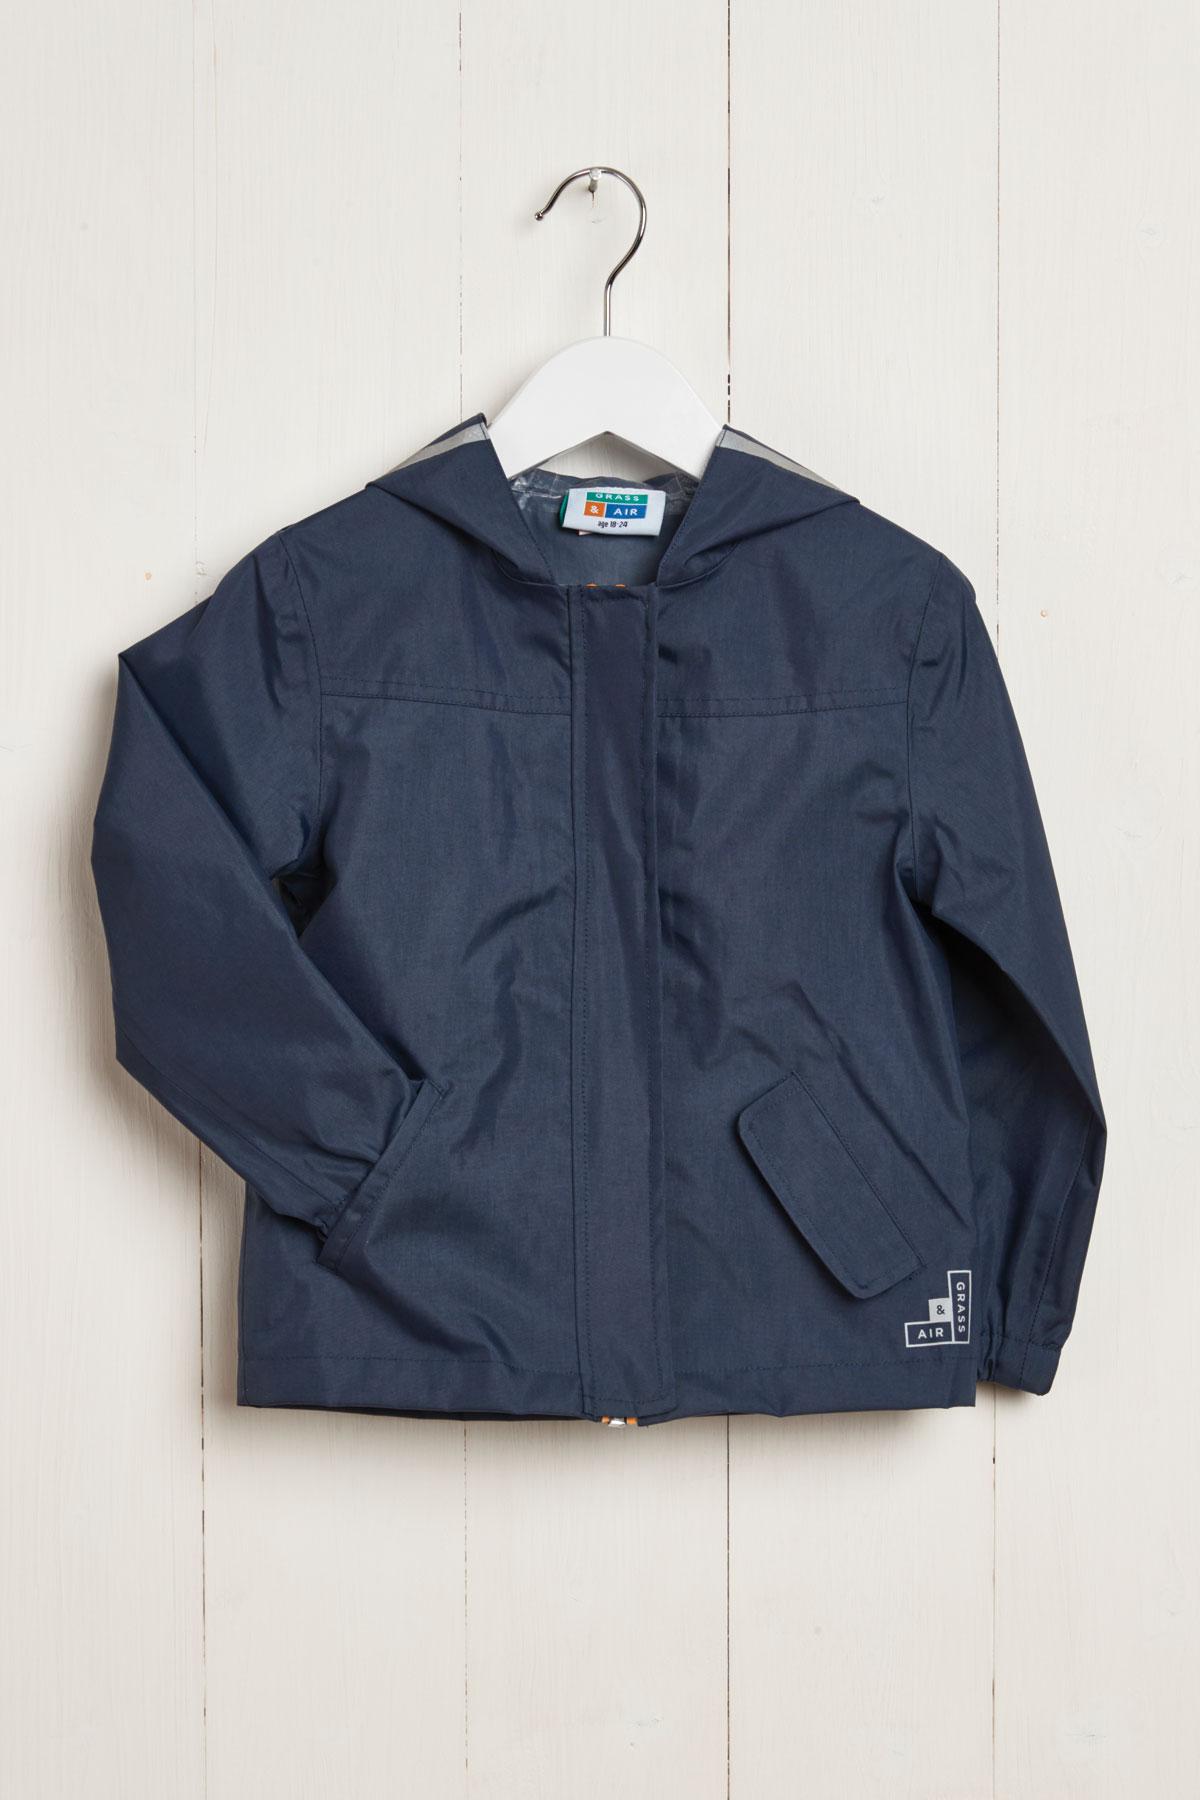 front product hanger shot of kids navy rain jacket